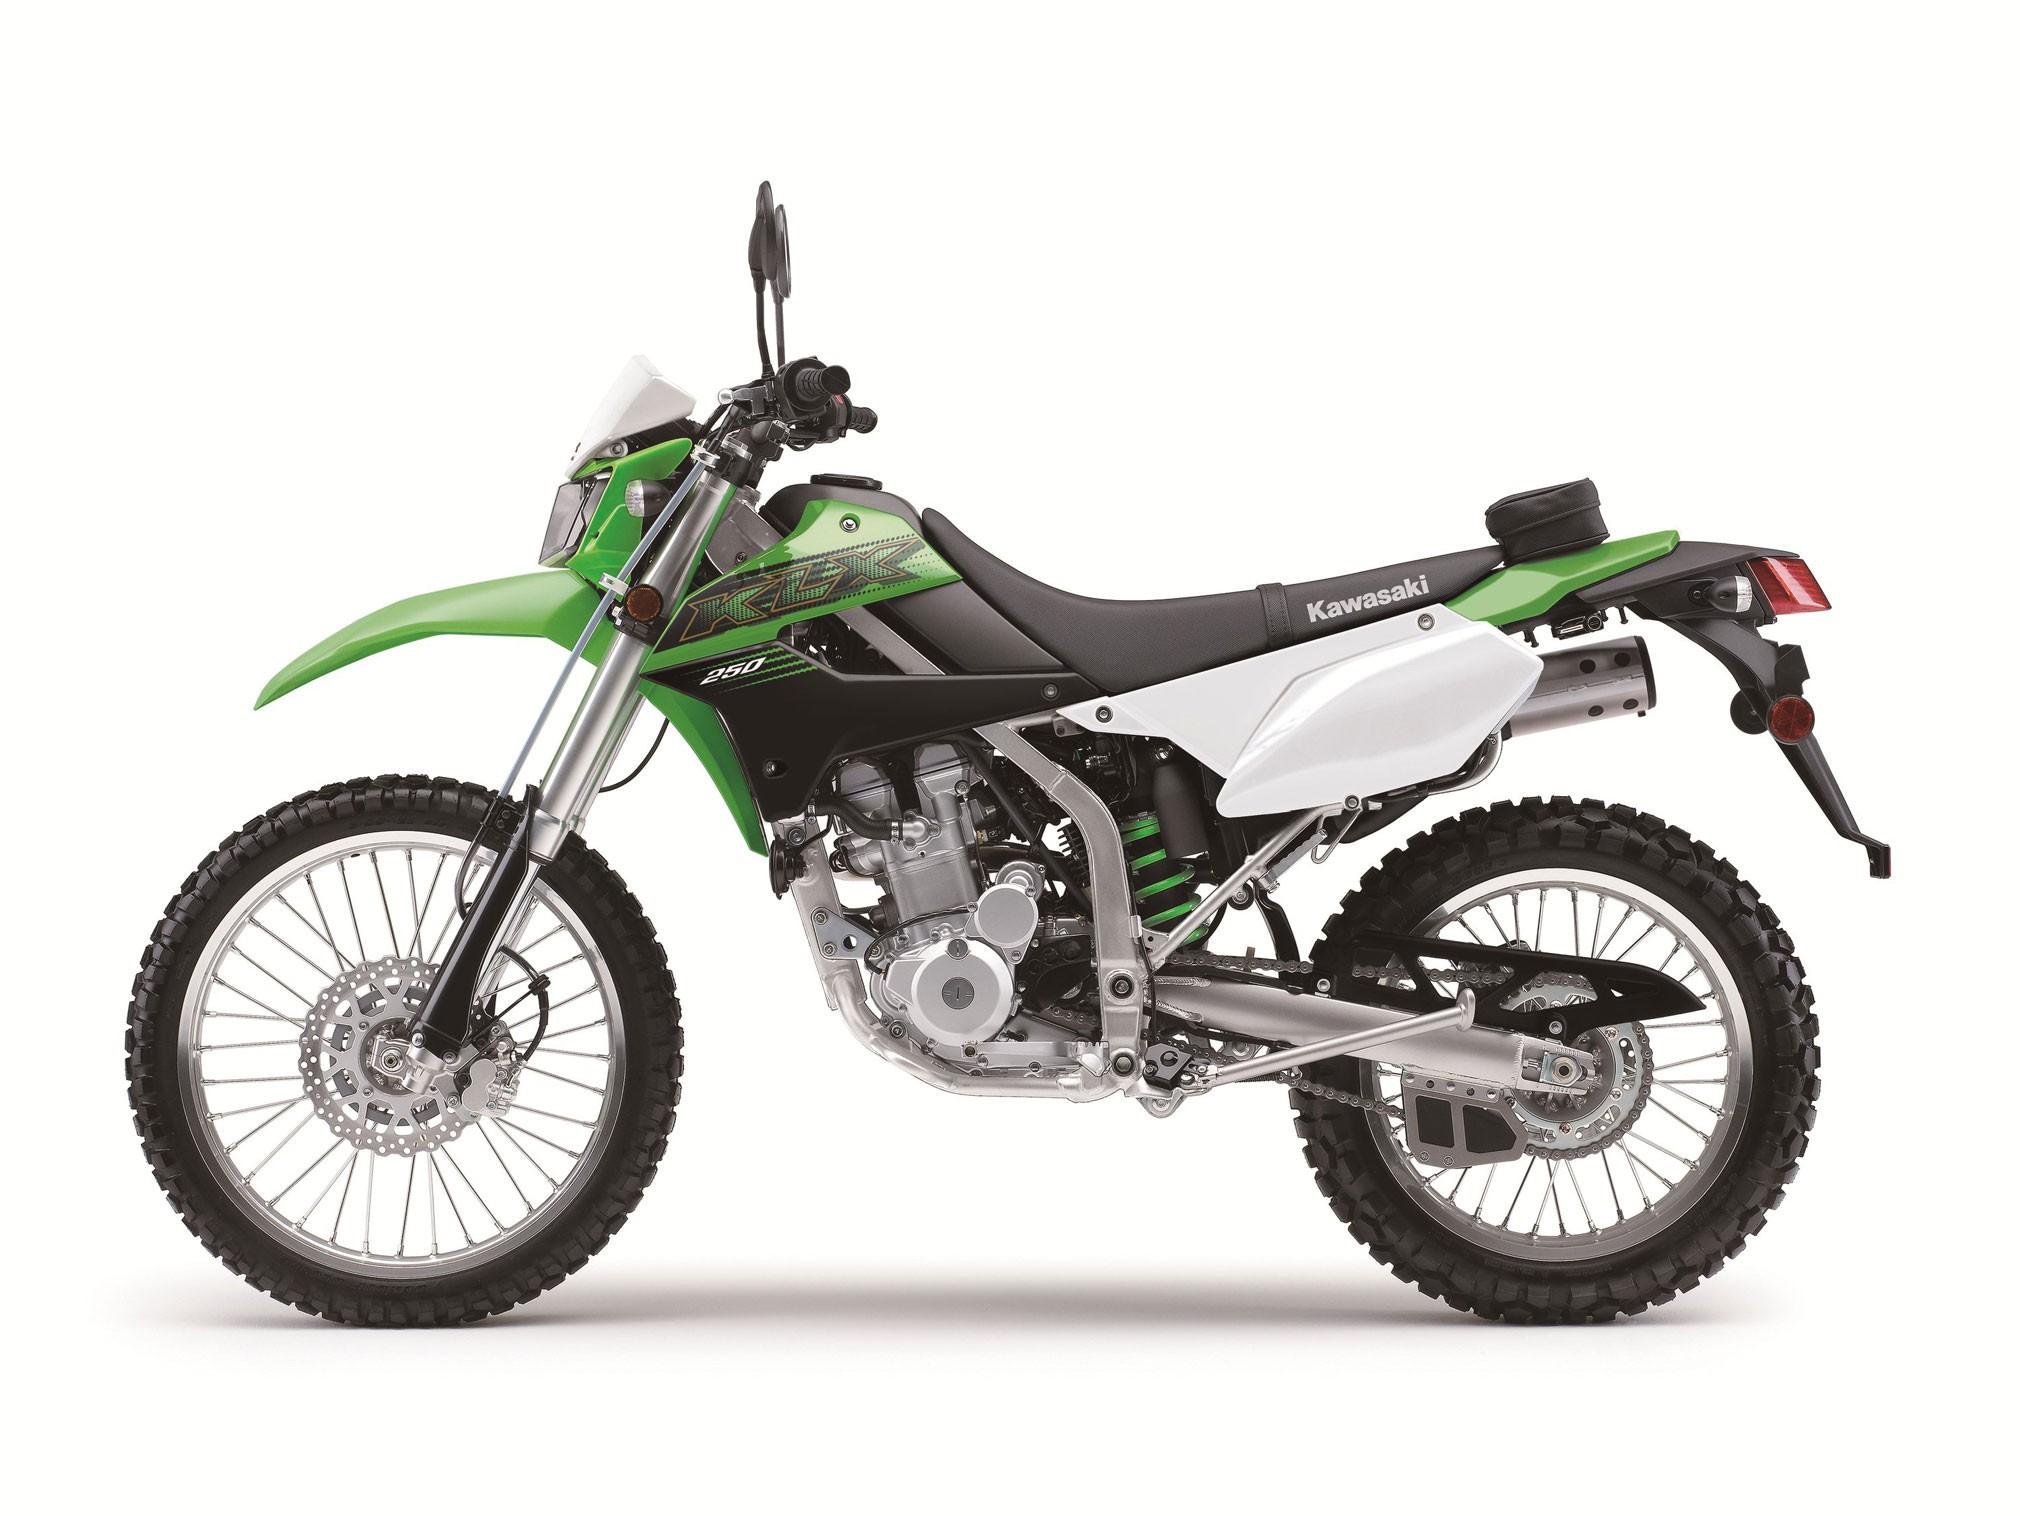 Kawasaki Klx 250 электрическая схема 2020 Kawasaki Klx250 Guide • total Motorcycle Of Kawasaki Klx 250 электрическая схема